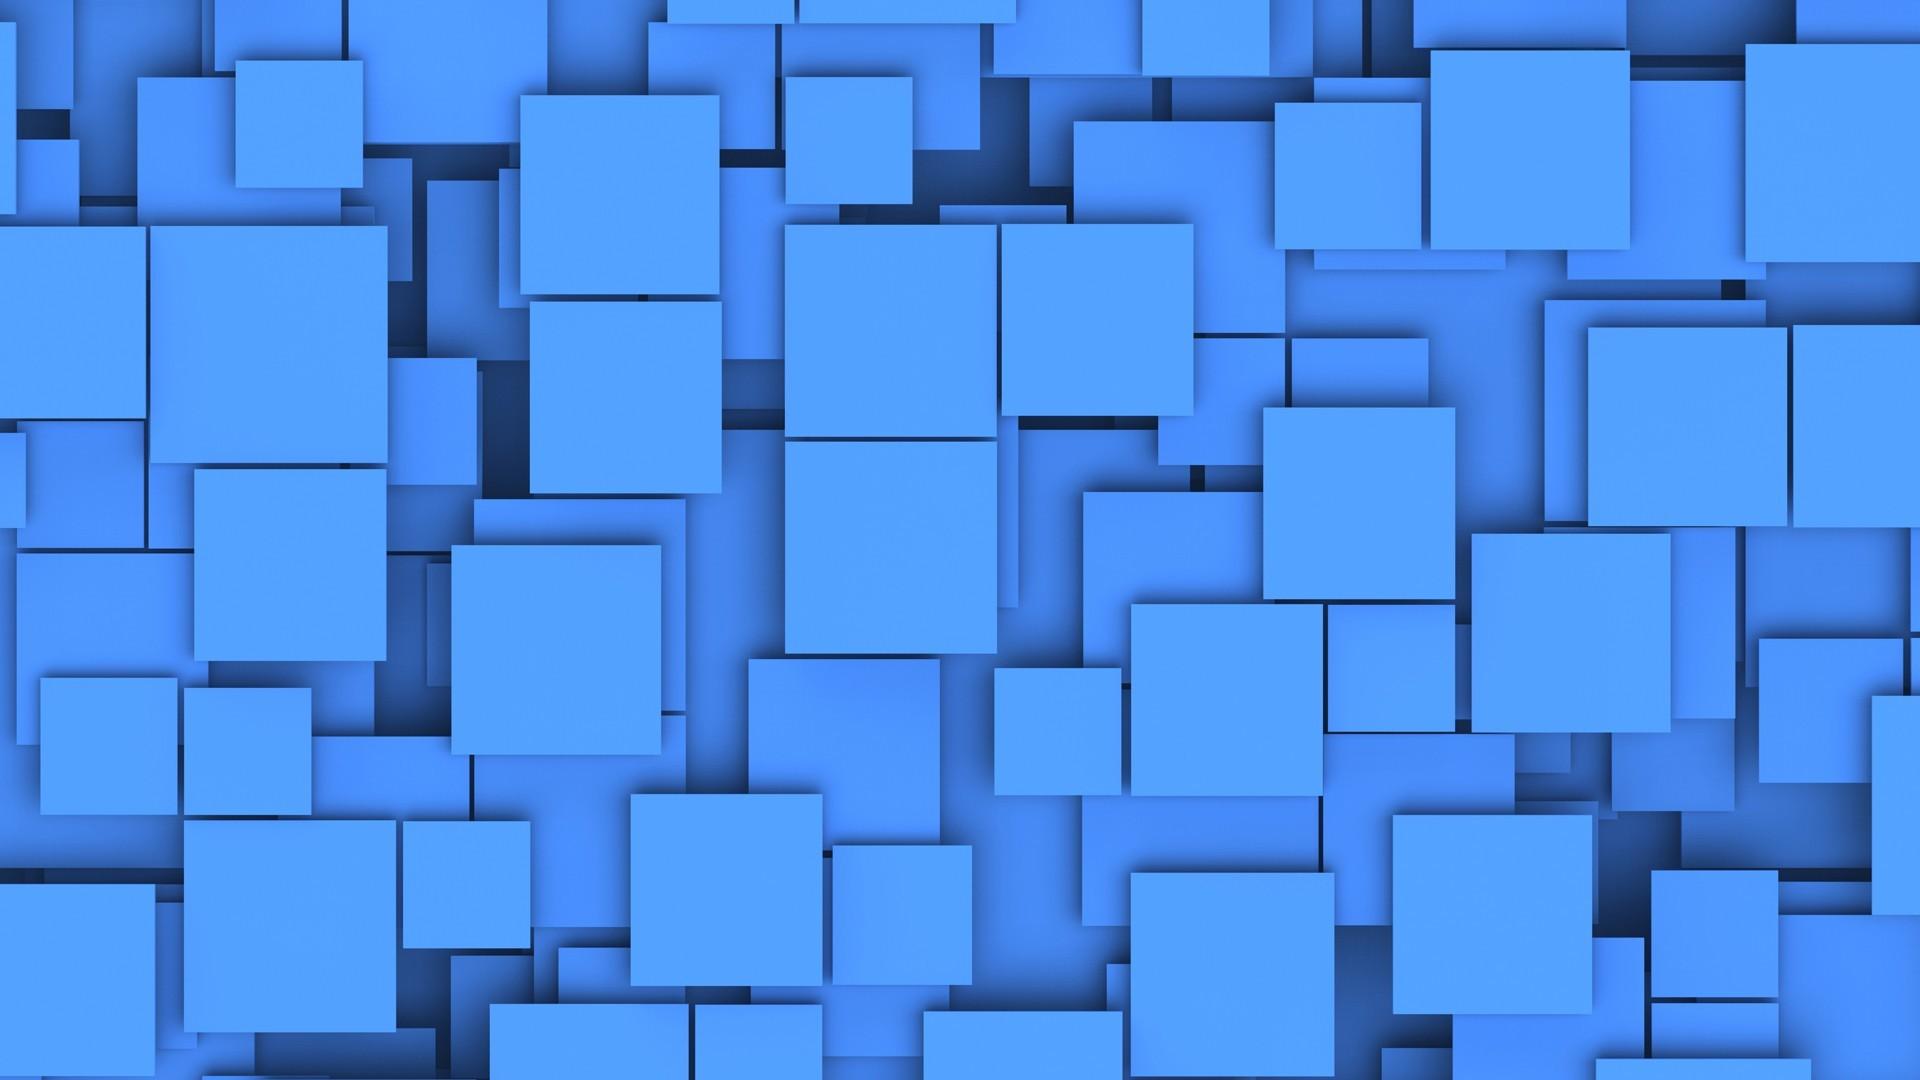 Wallpaper : minimalism, wall, symmetry, blue, pattern ...